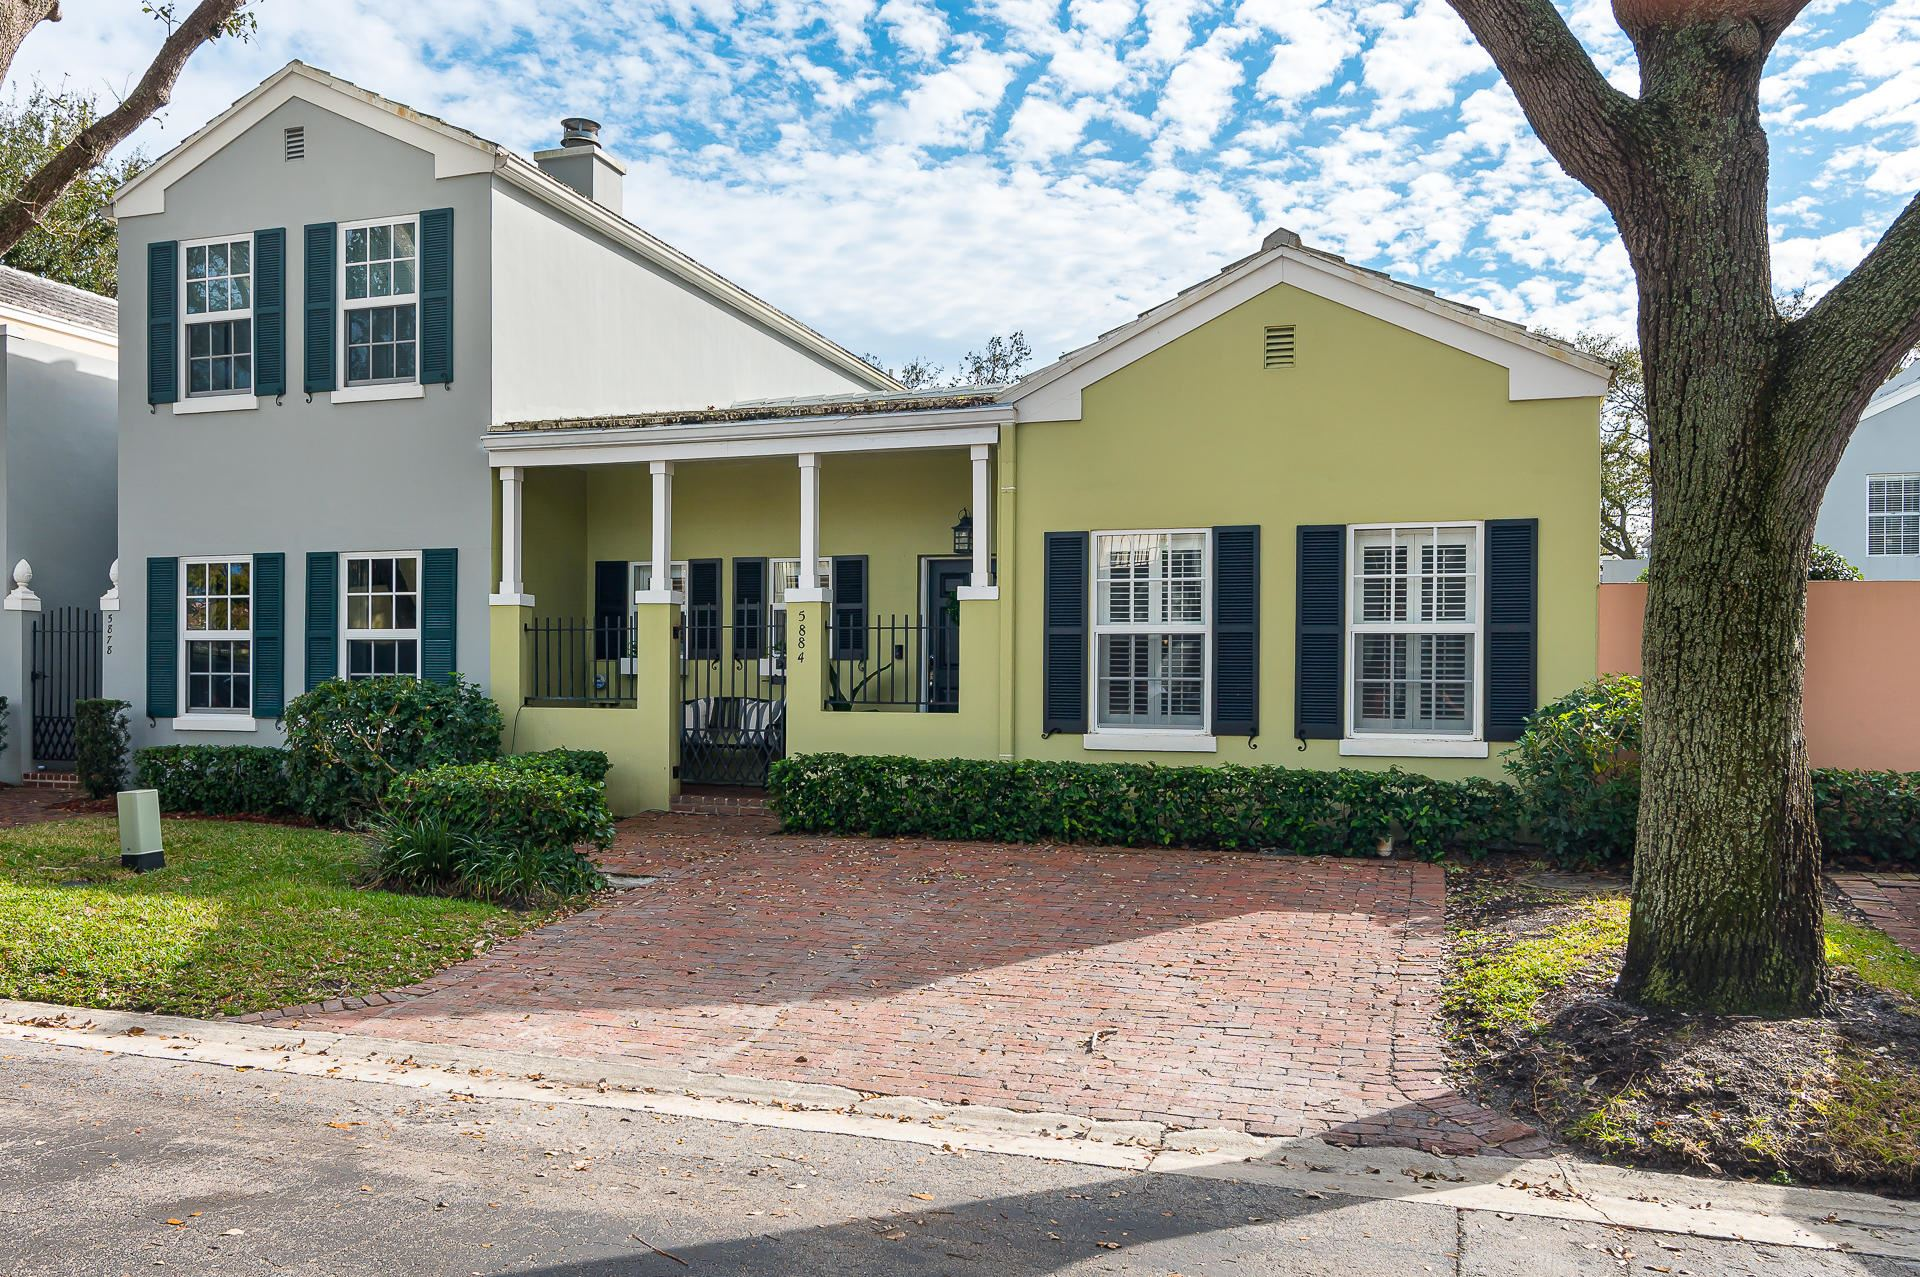 5884 Bartram Street, Boca Raton, FL 33433 - #: RX-10684890